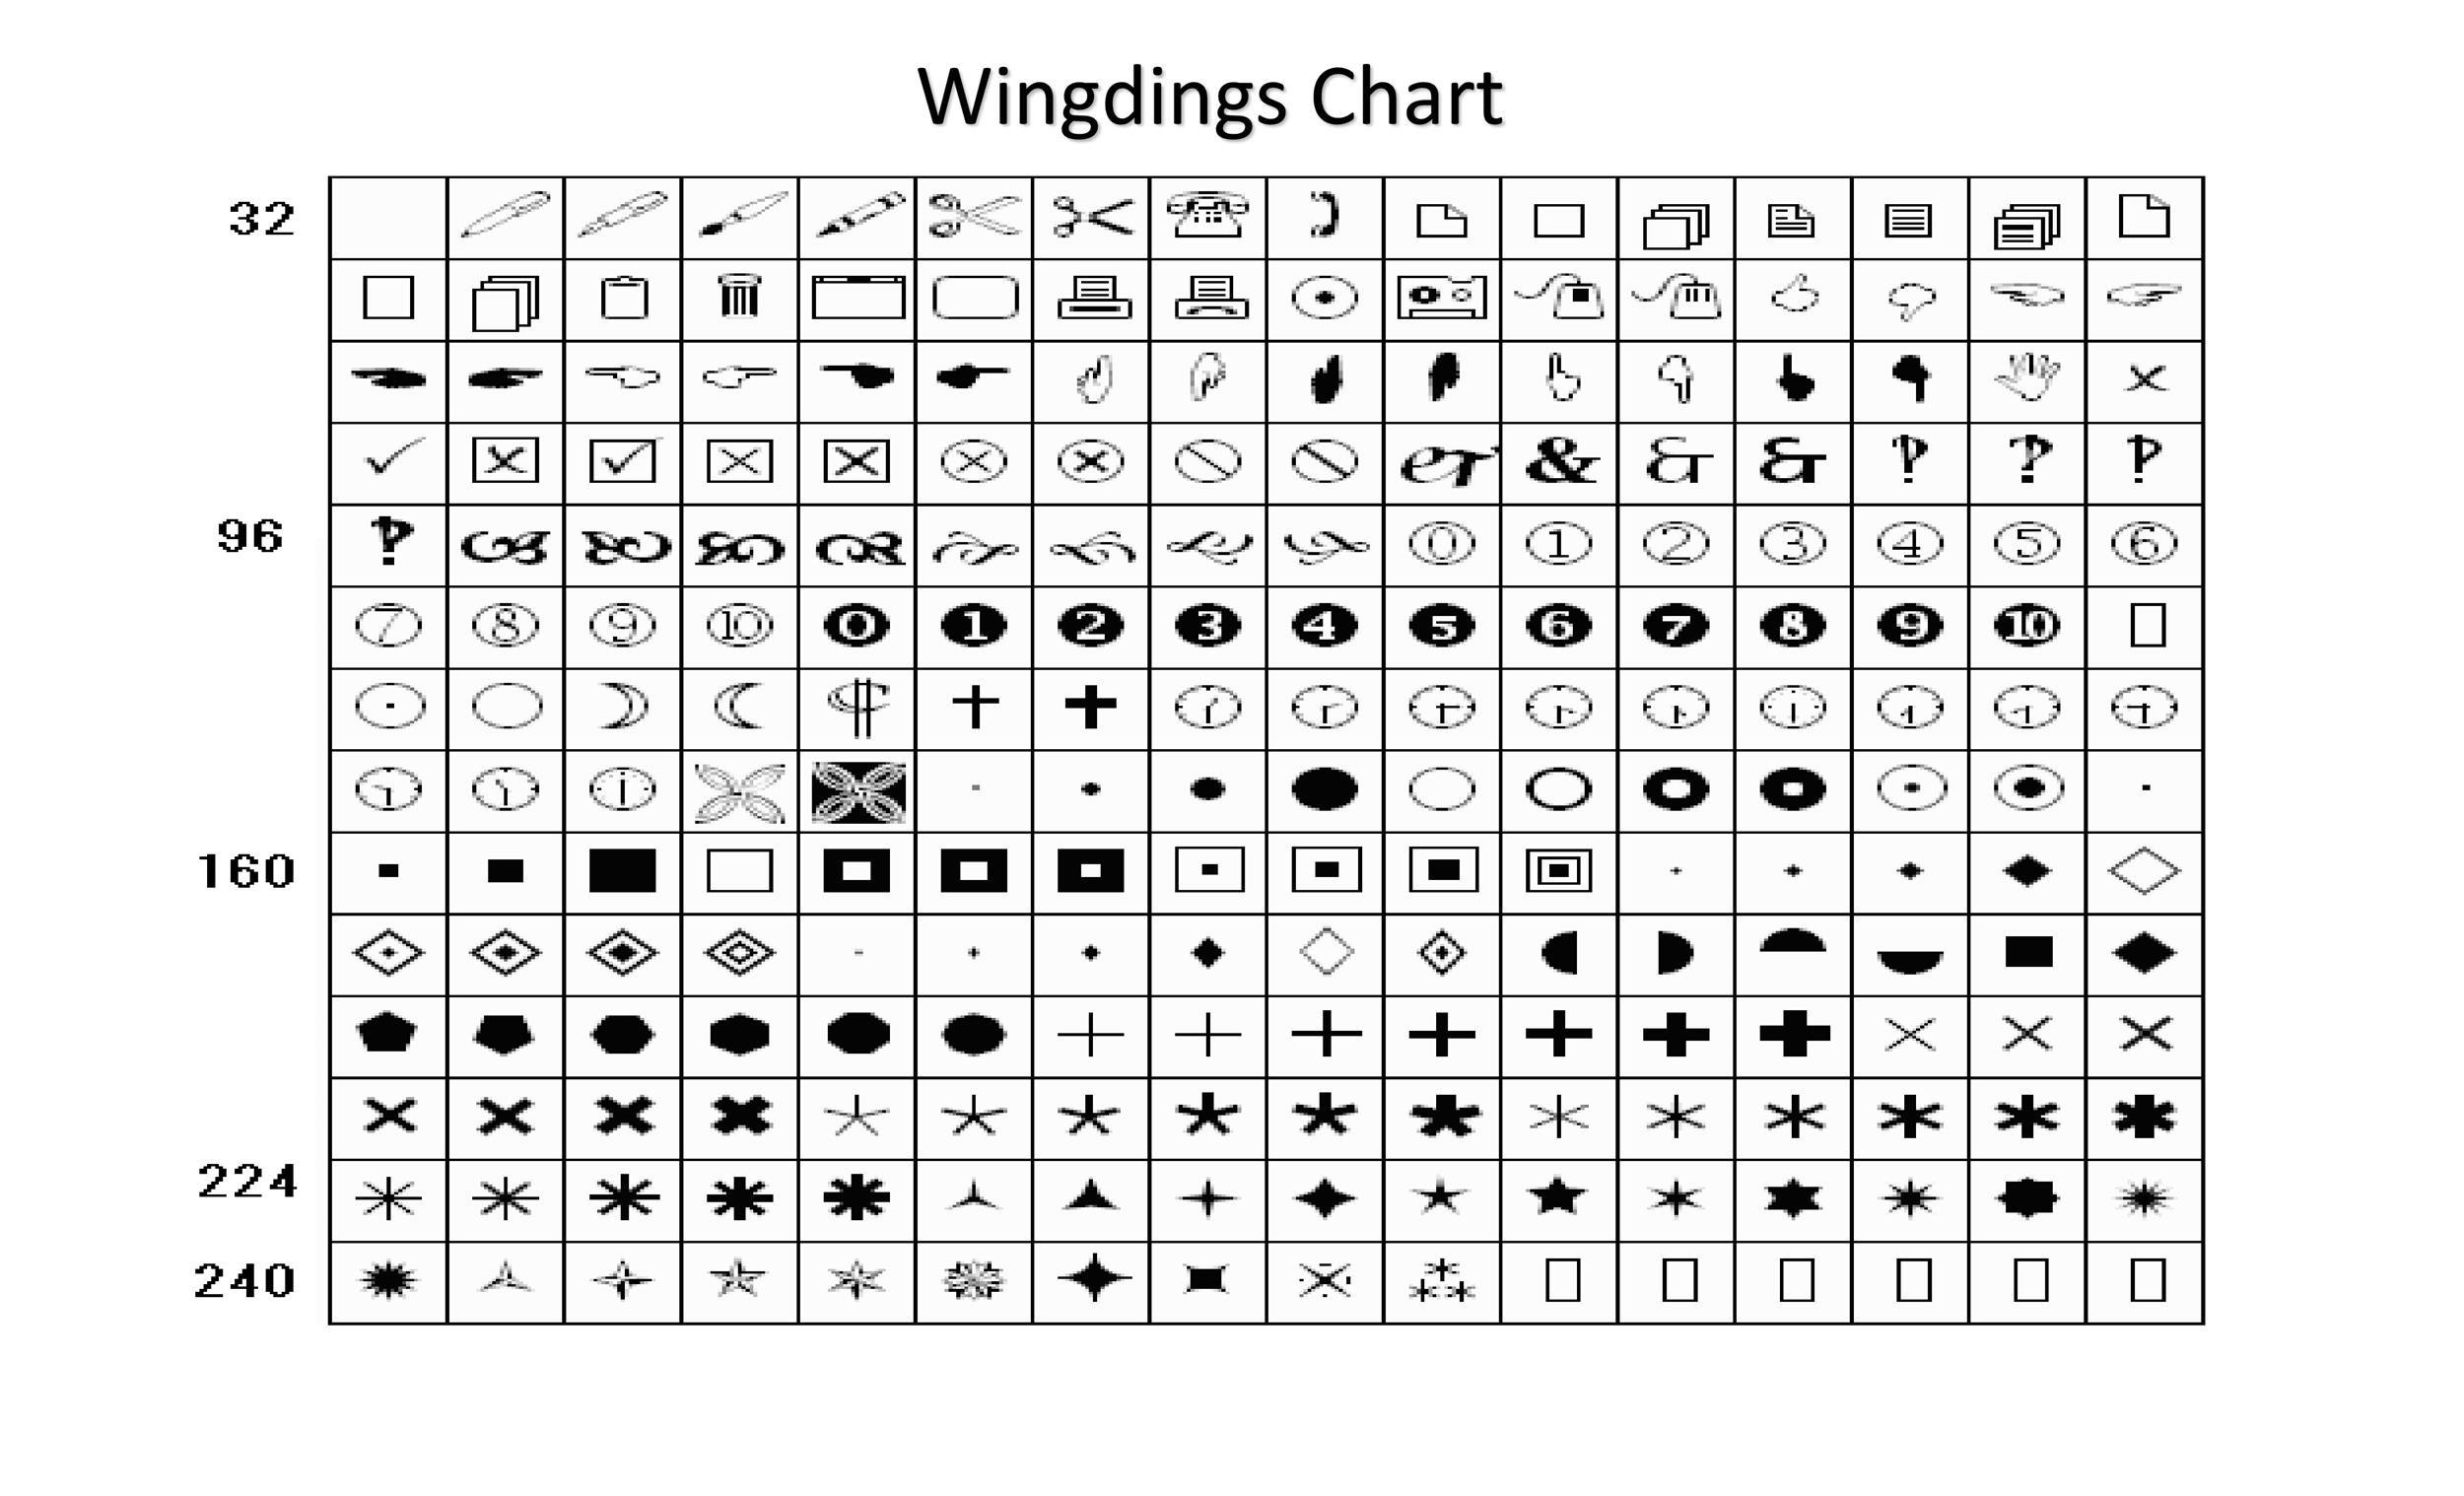 Free wingdings translator template 31